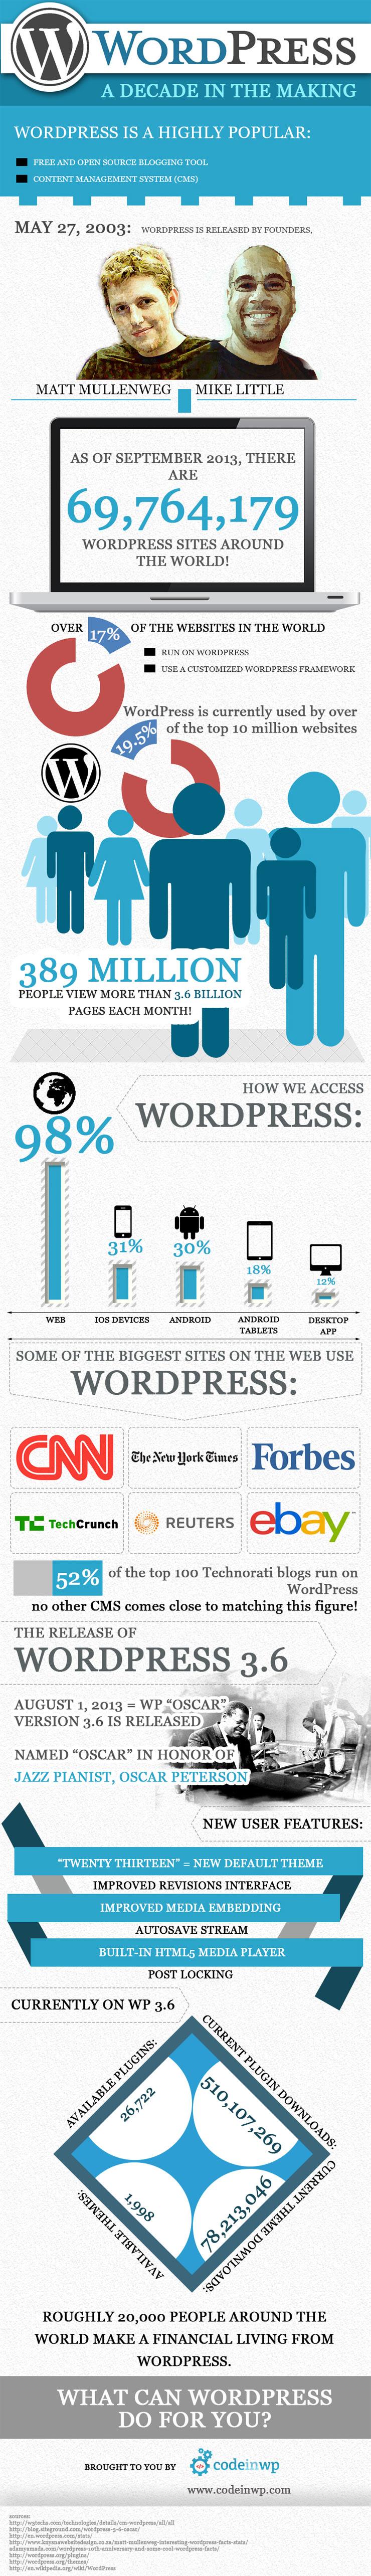 Wordpress Facts